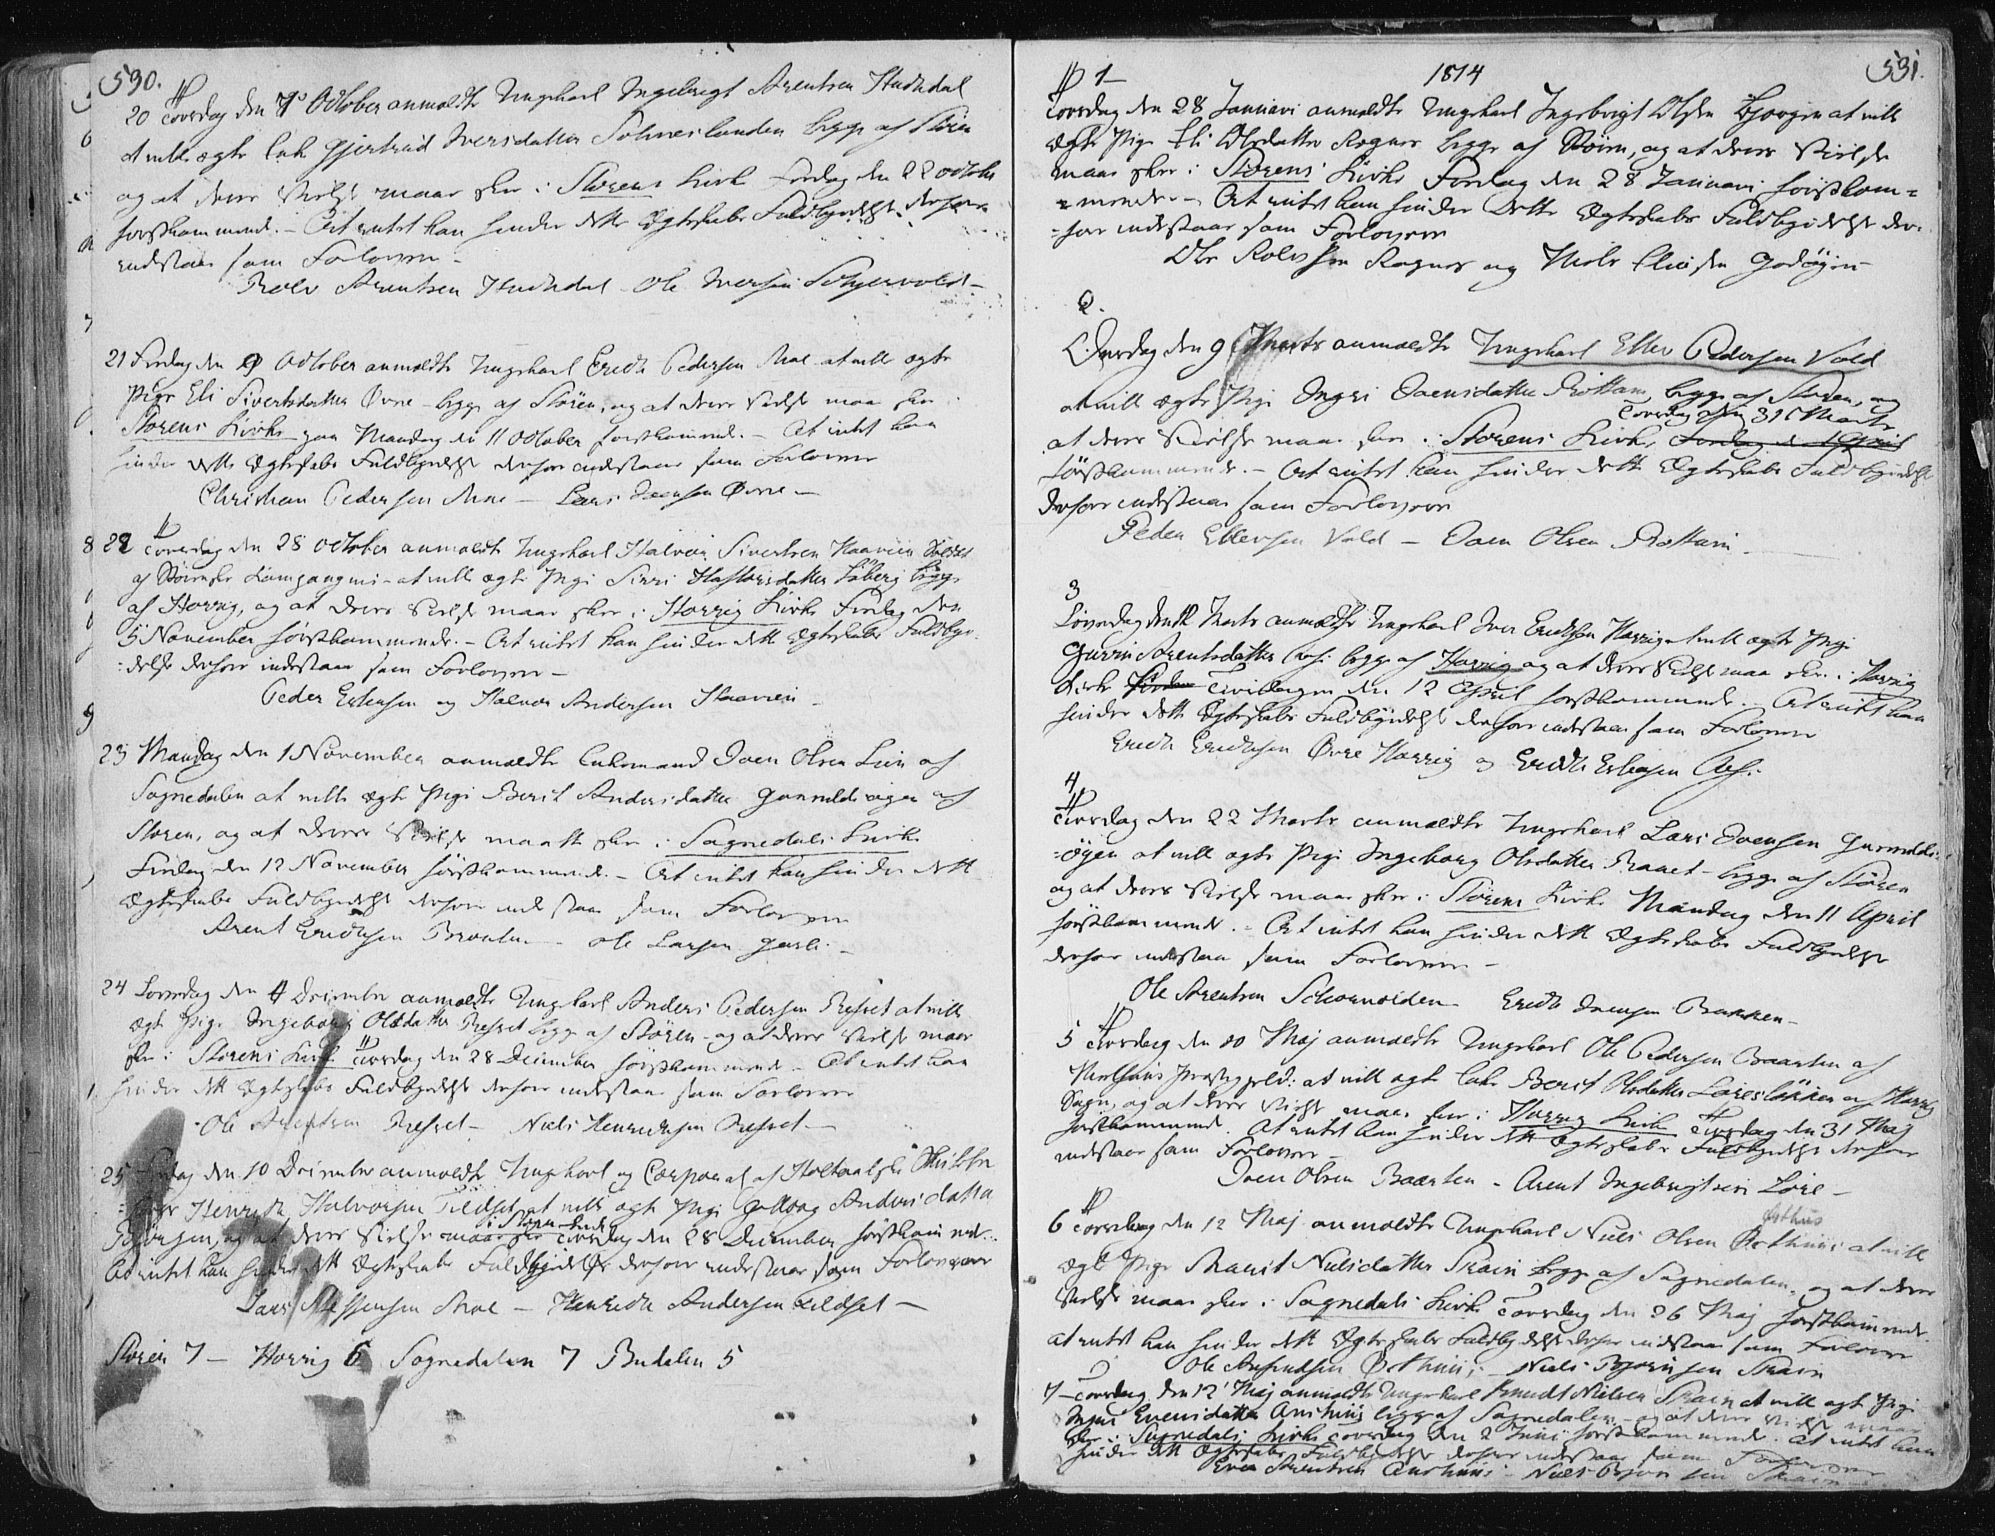 SAT, Ministerialprotokoller, klokkerbøker og fødselsregistre - Sør-Trøndelag, 687/L0992: Parish register (official) no. 687A03 /1, 1788-1815, p. 530-531